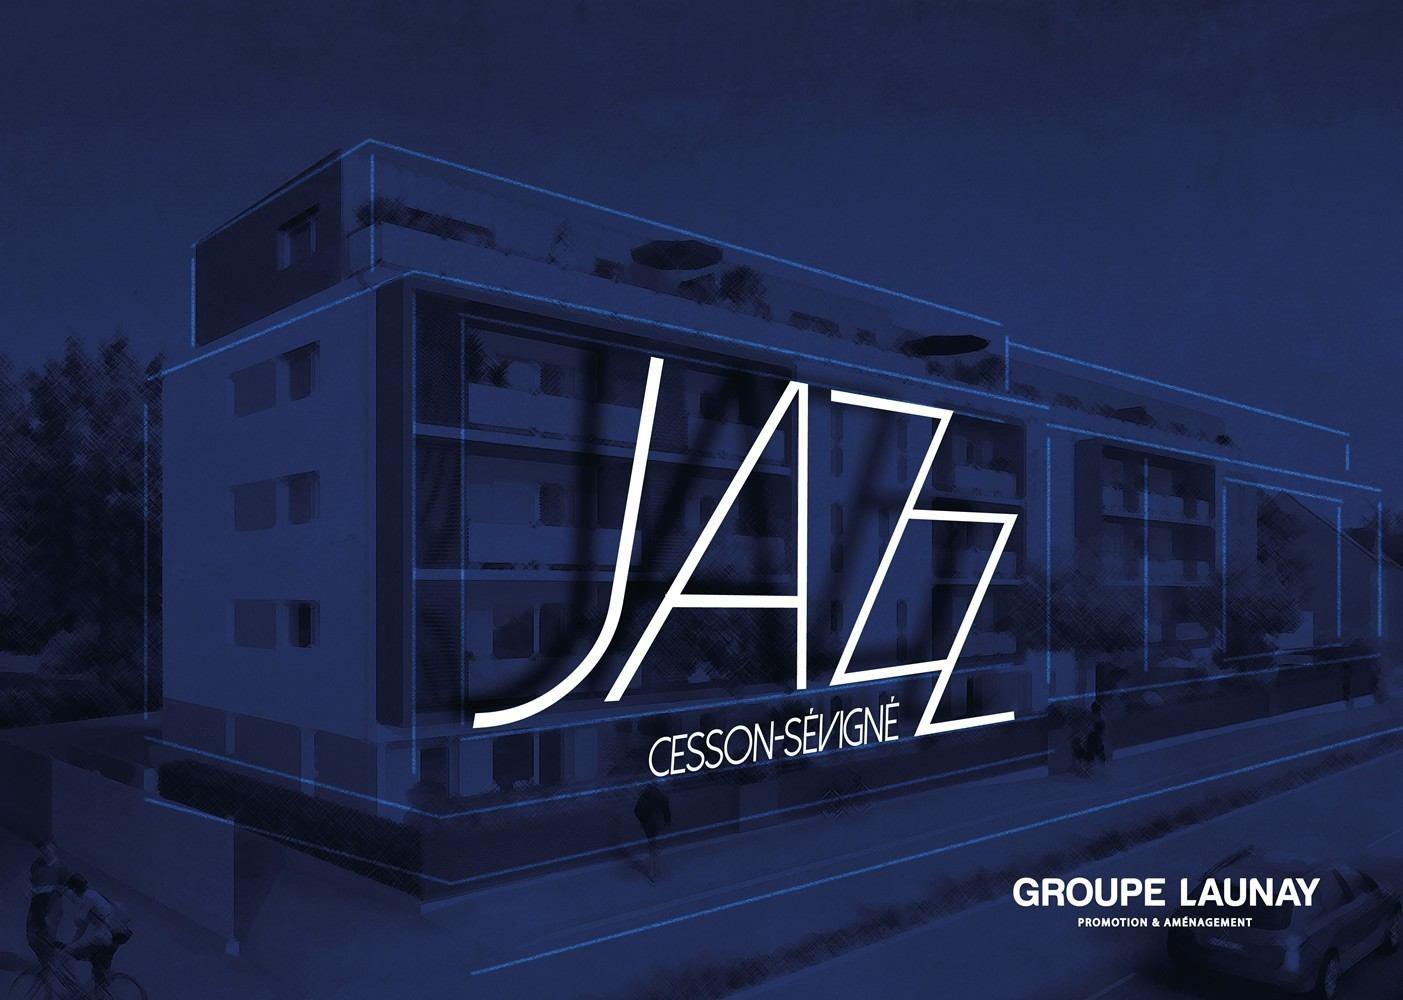 Jazz - Cesson-Sévigné